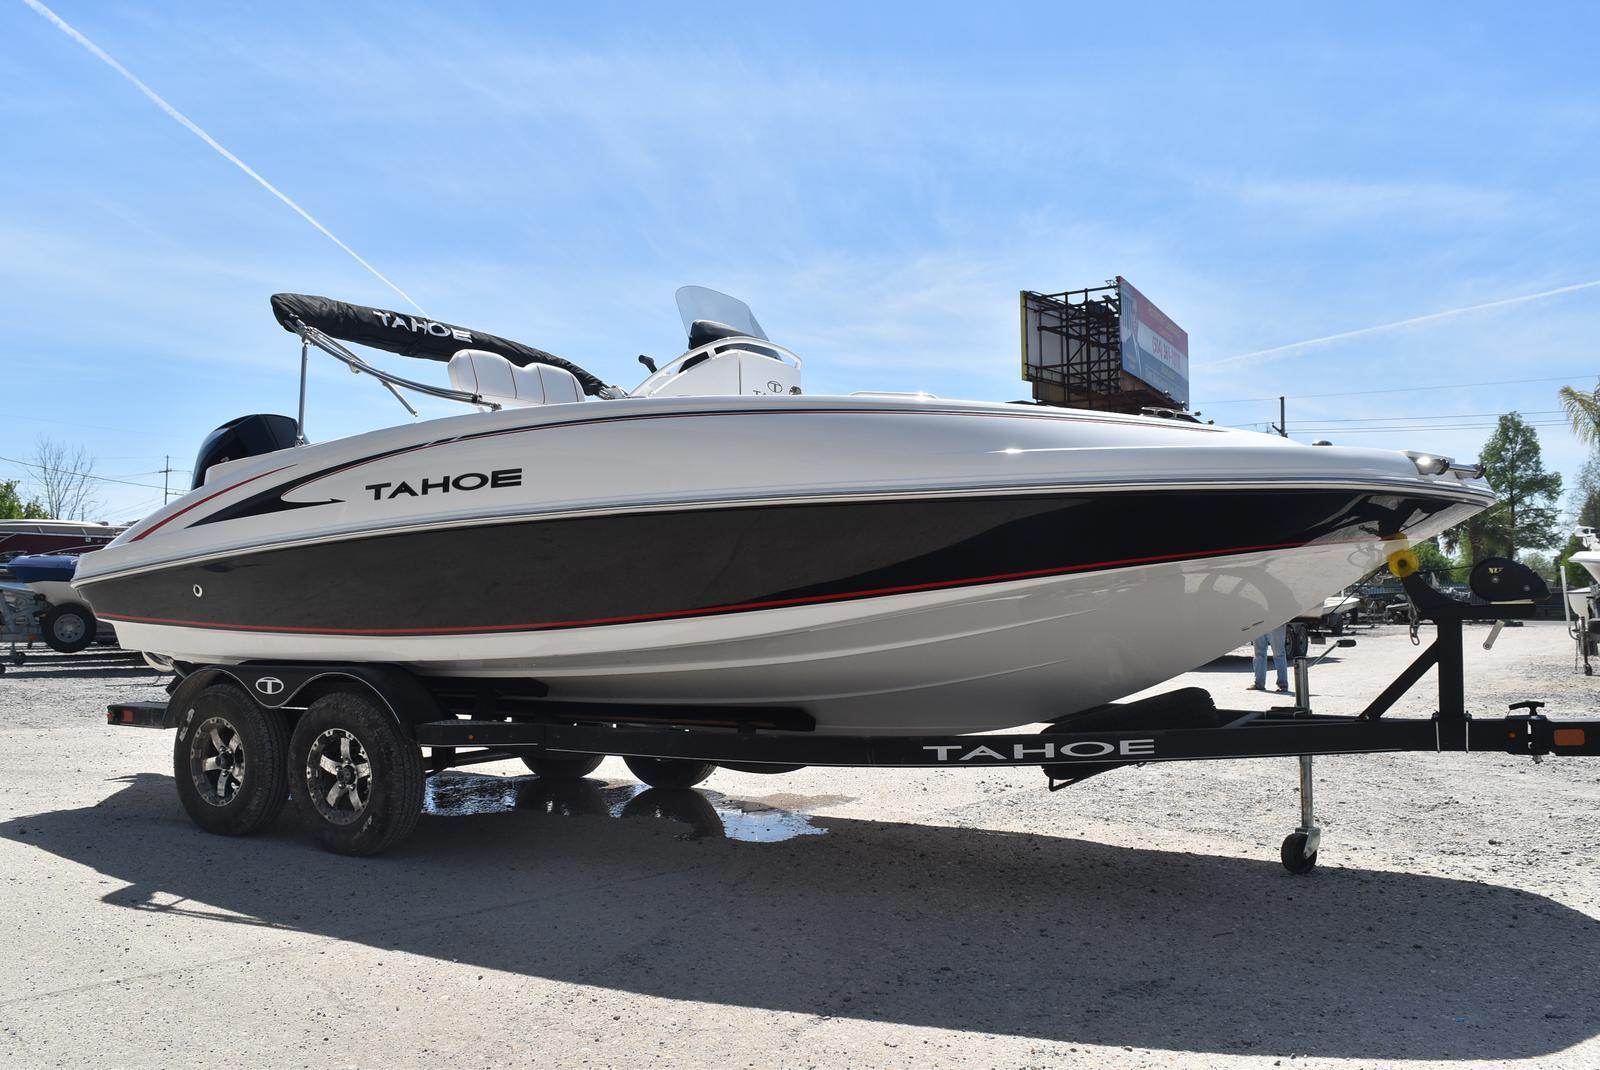 New  2019 Tahoe Boats Deck Boat in Marrero, Louisiana